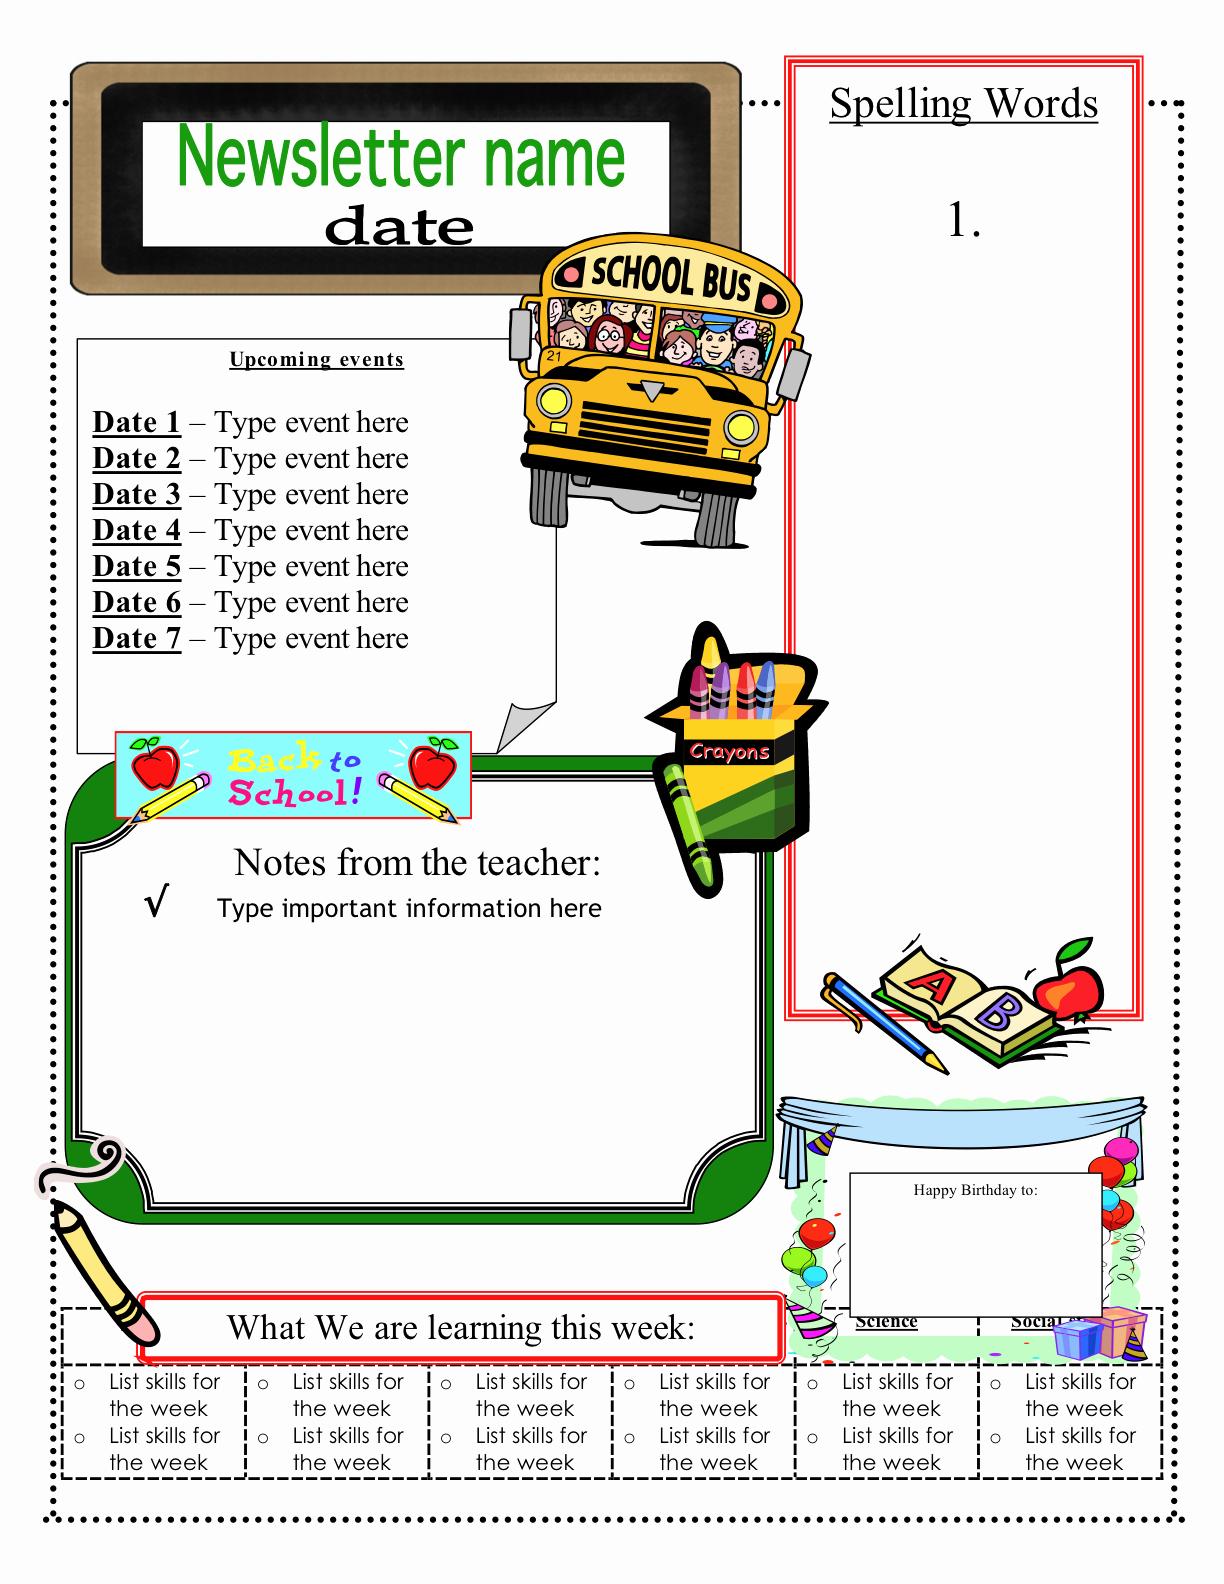 Free Teacher Newsletter Templates Word New Free Classroom Newsletter Templates Check Out these Eight